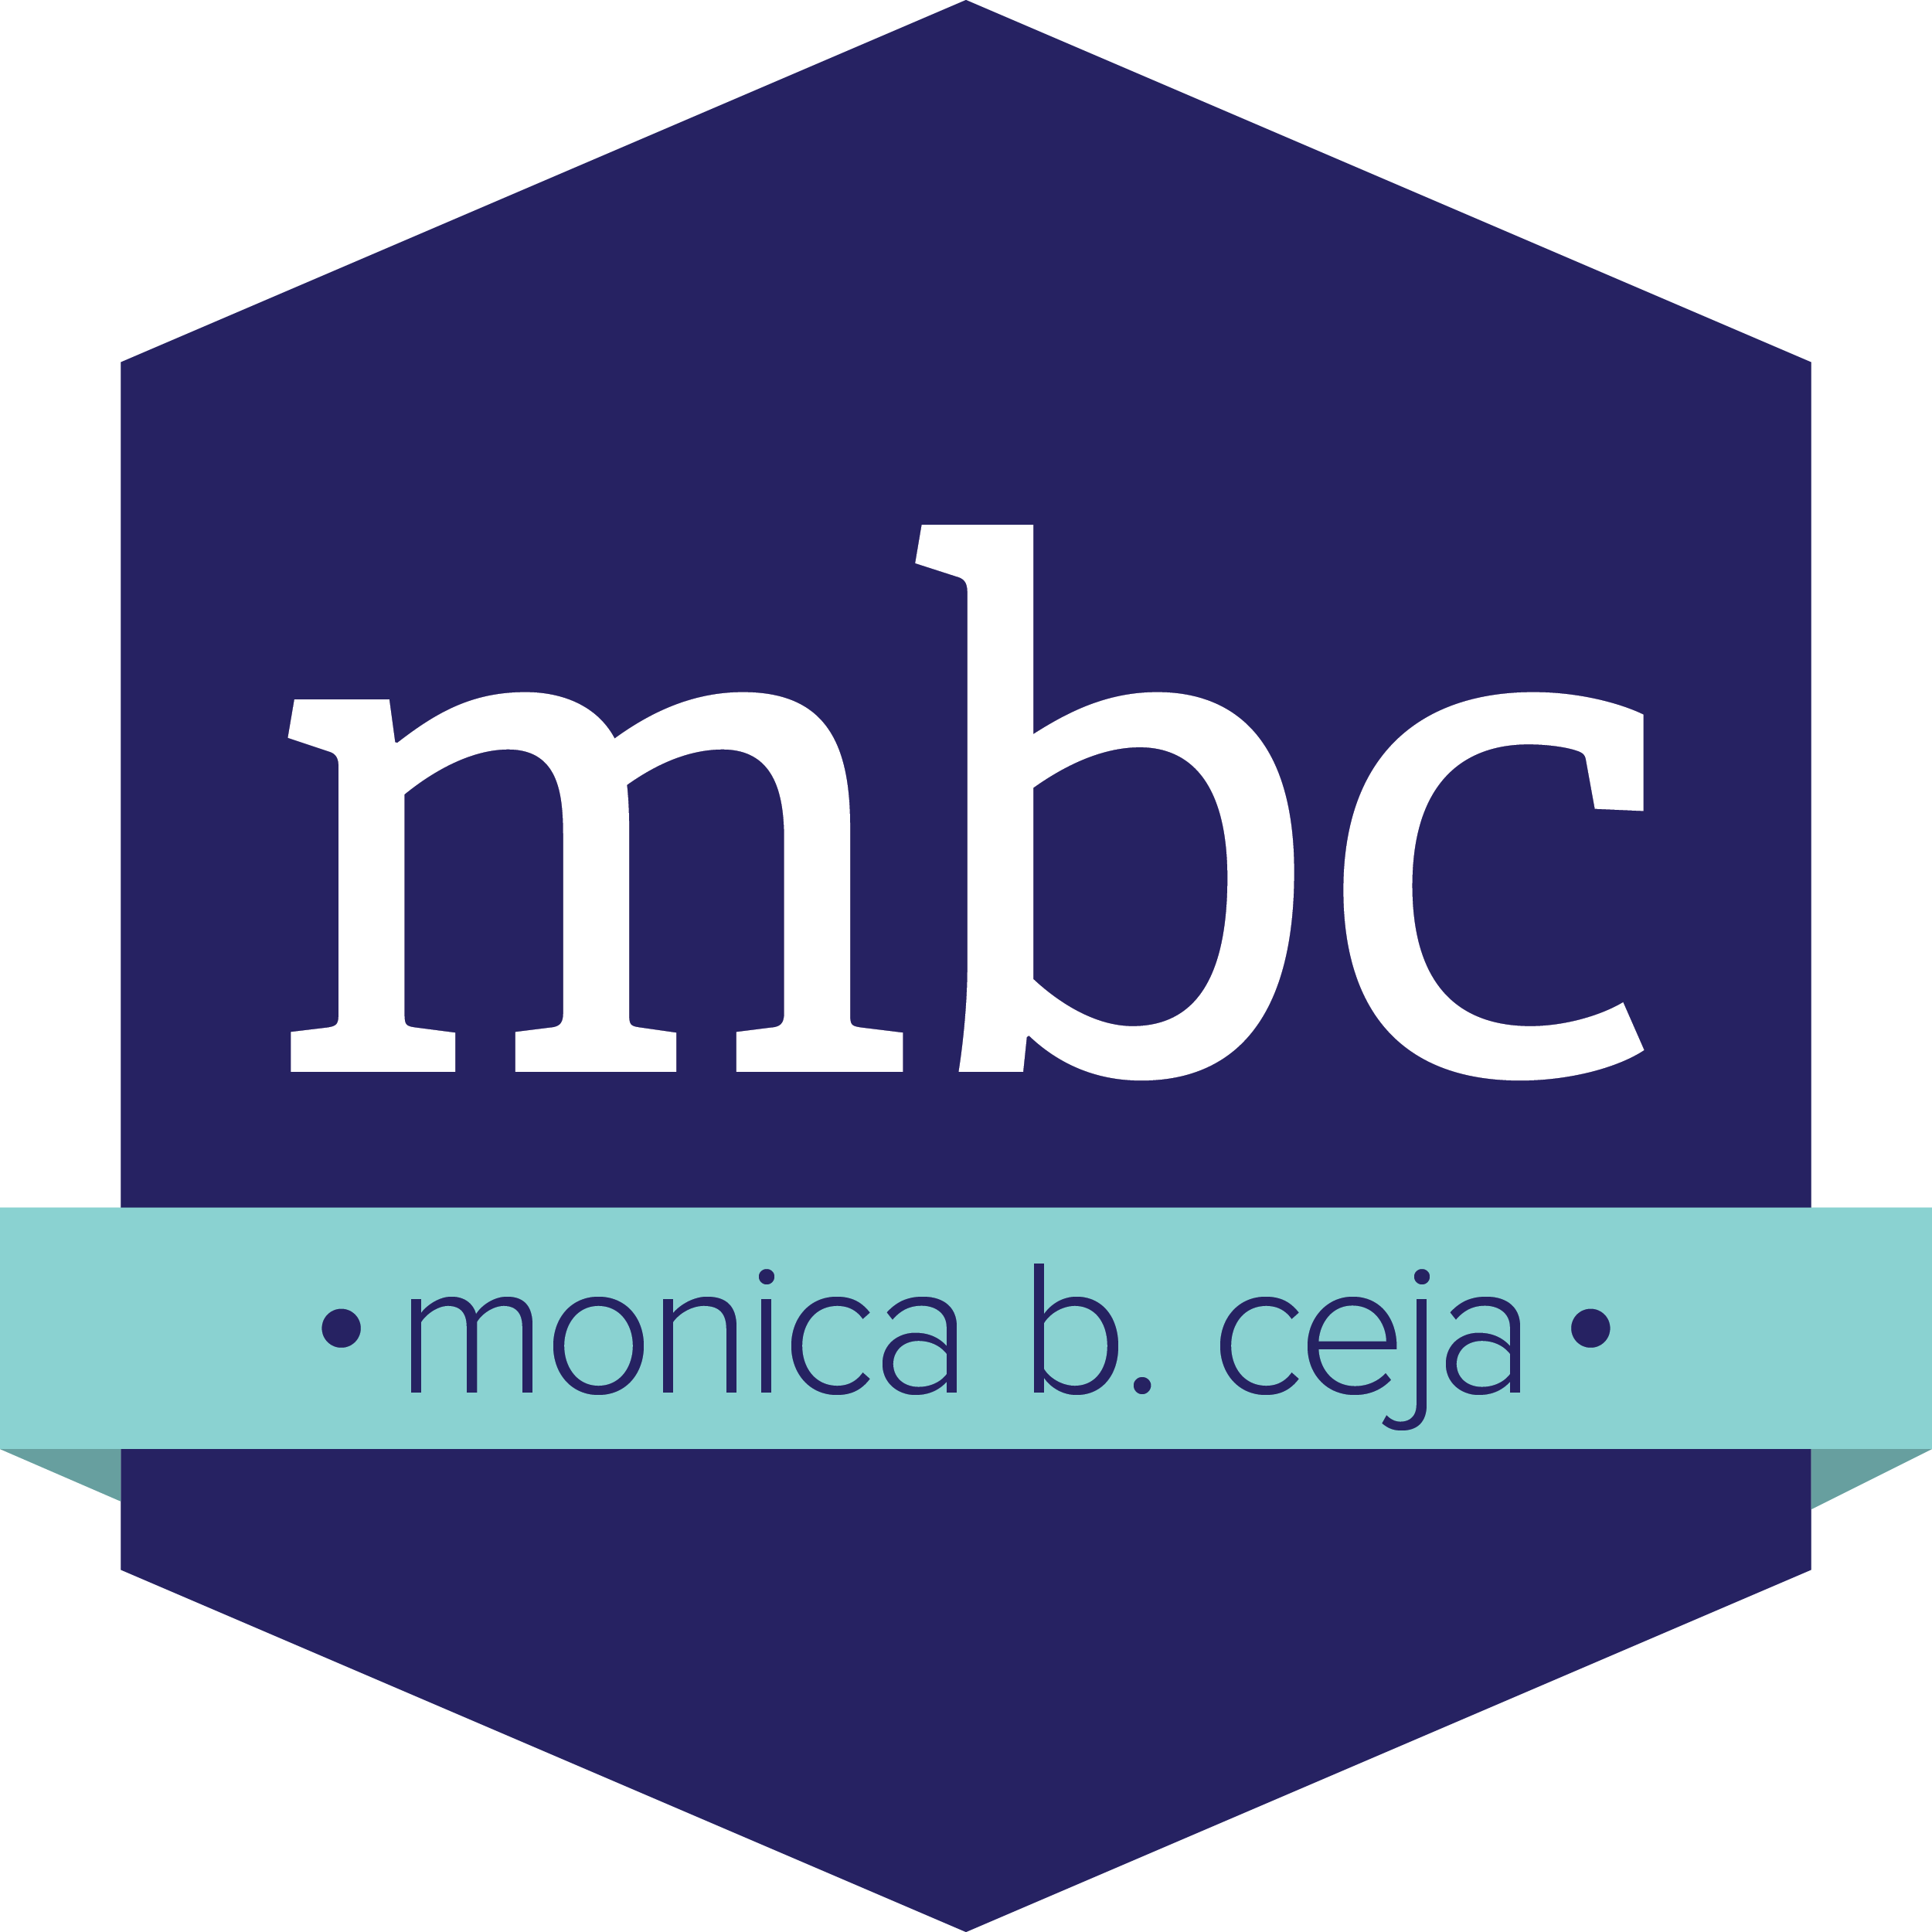 Monica B. Ceja